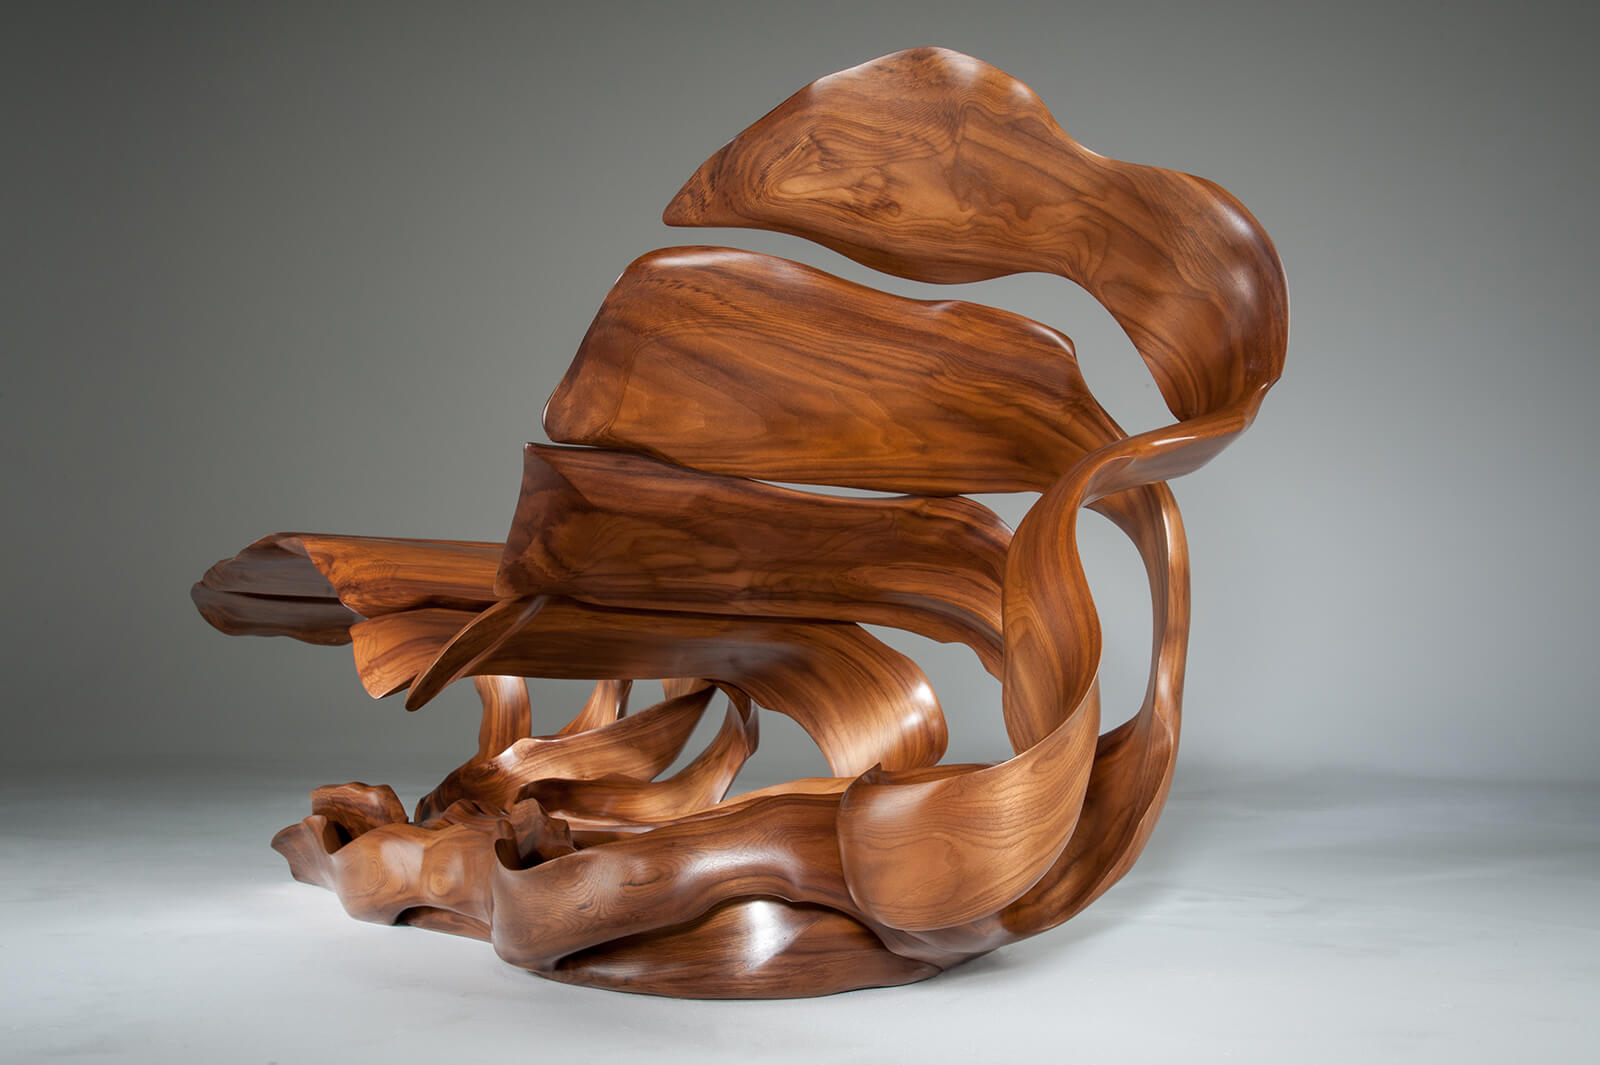 Marc Fish, 'Laminaria chaise', 2015 COURTESY: Marc Fish / PHOTOGRAPHER: Simon Eldon